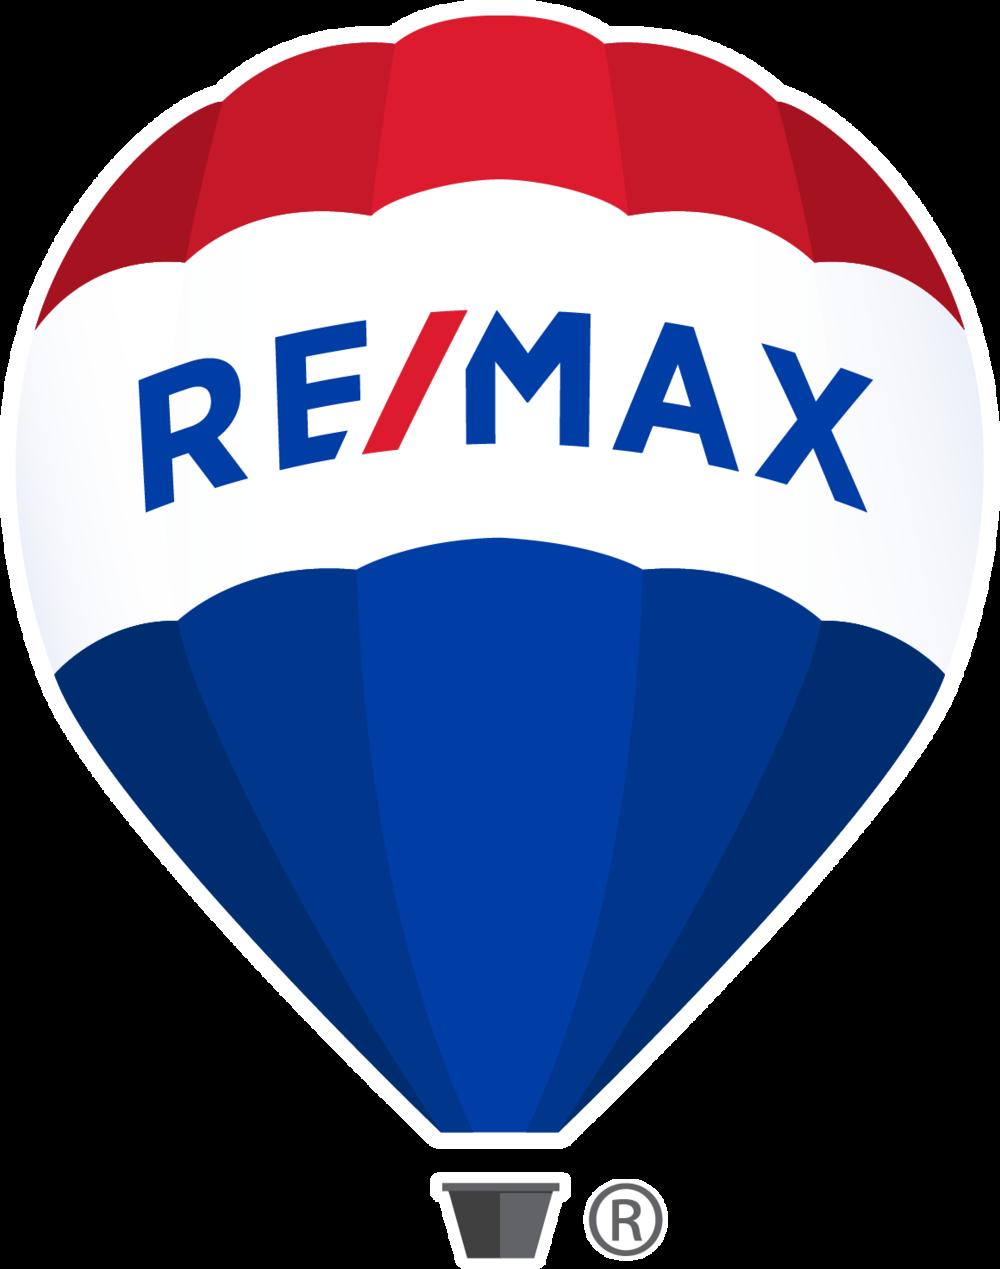 Transparent-REMAX_mastrBalloon_RGB_R.png